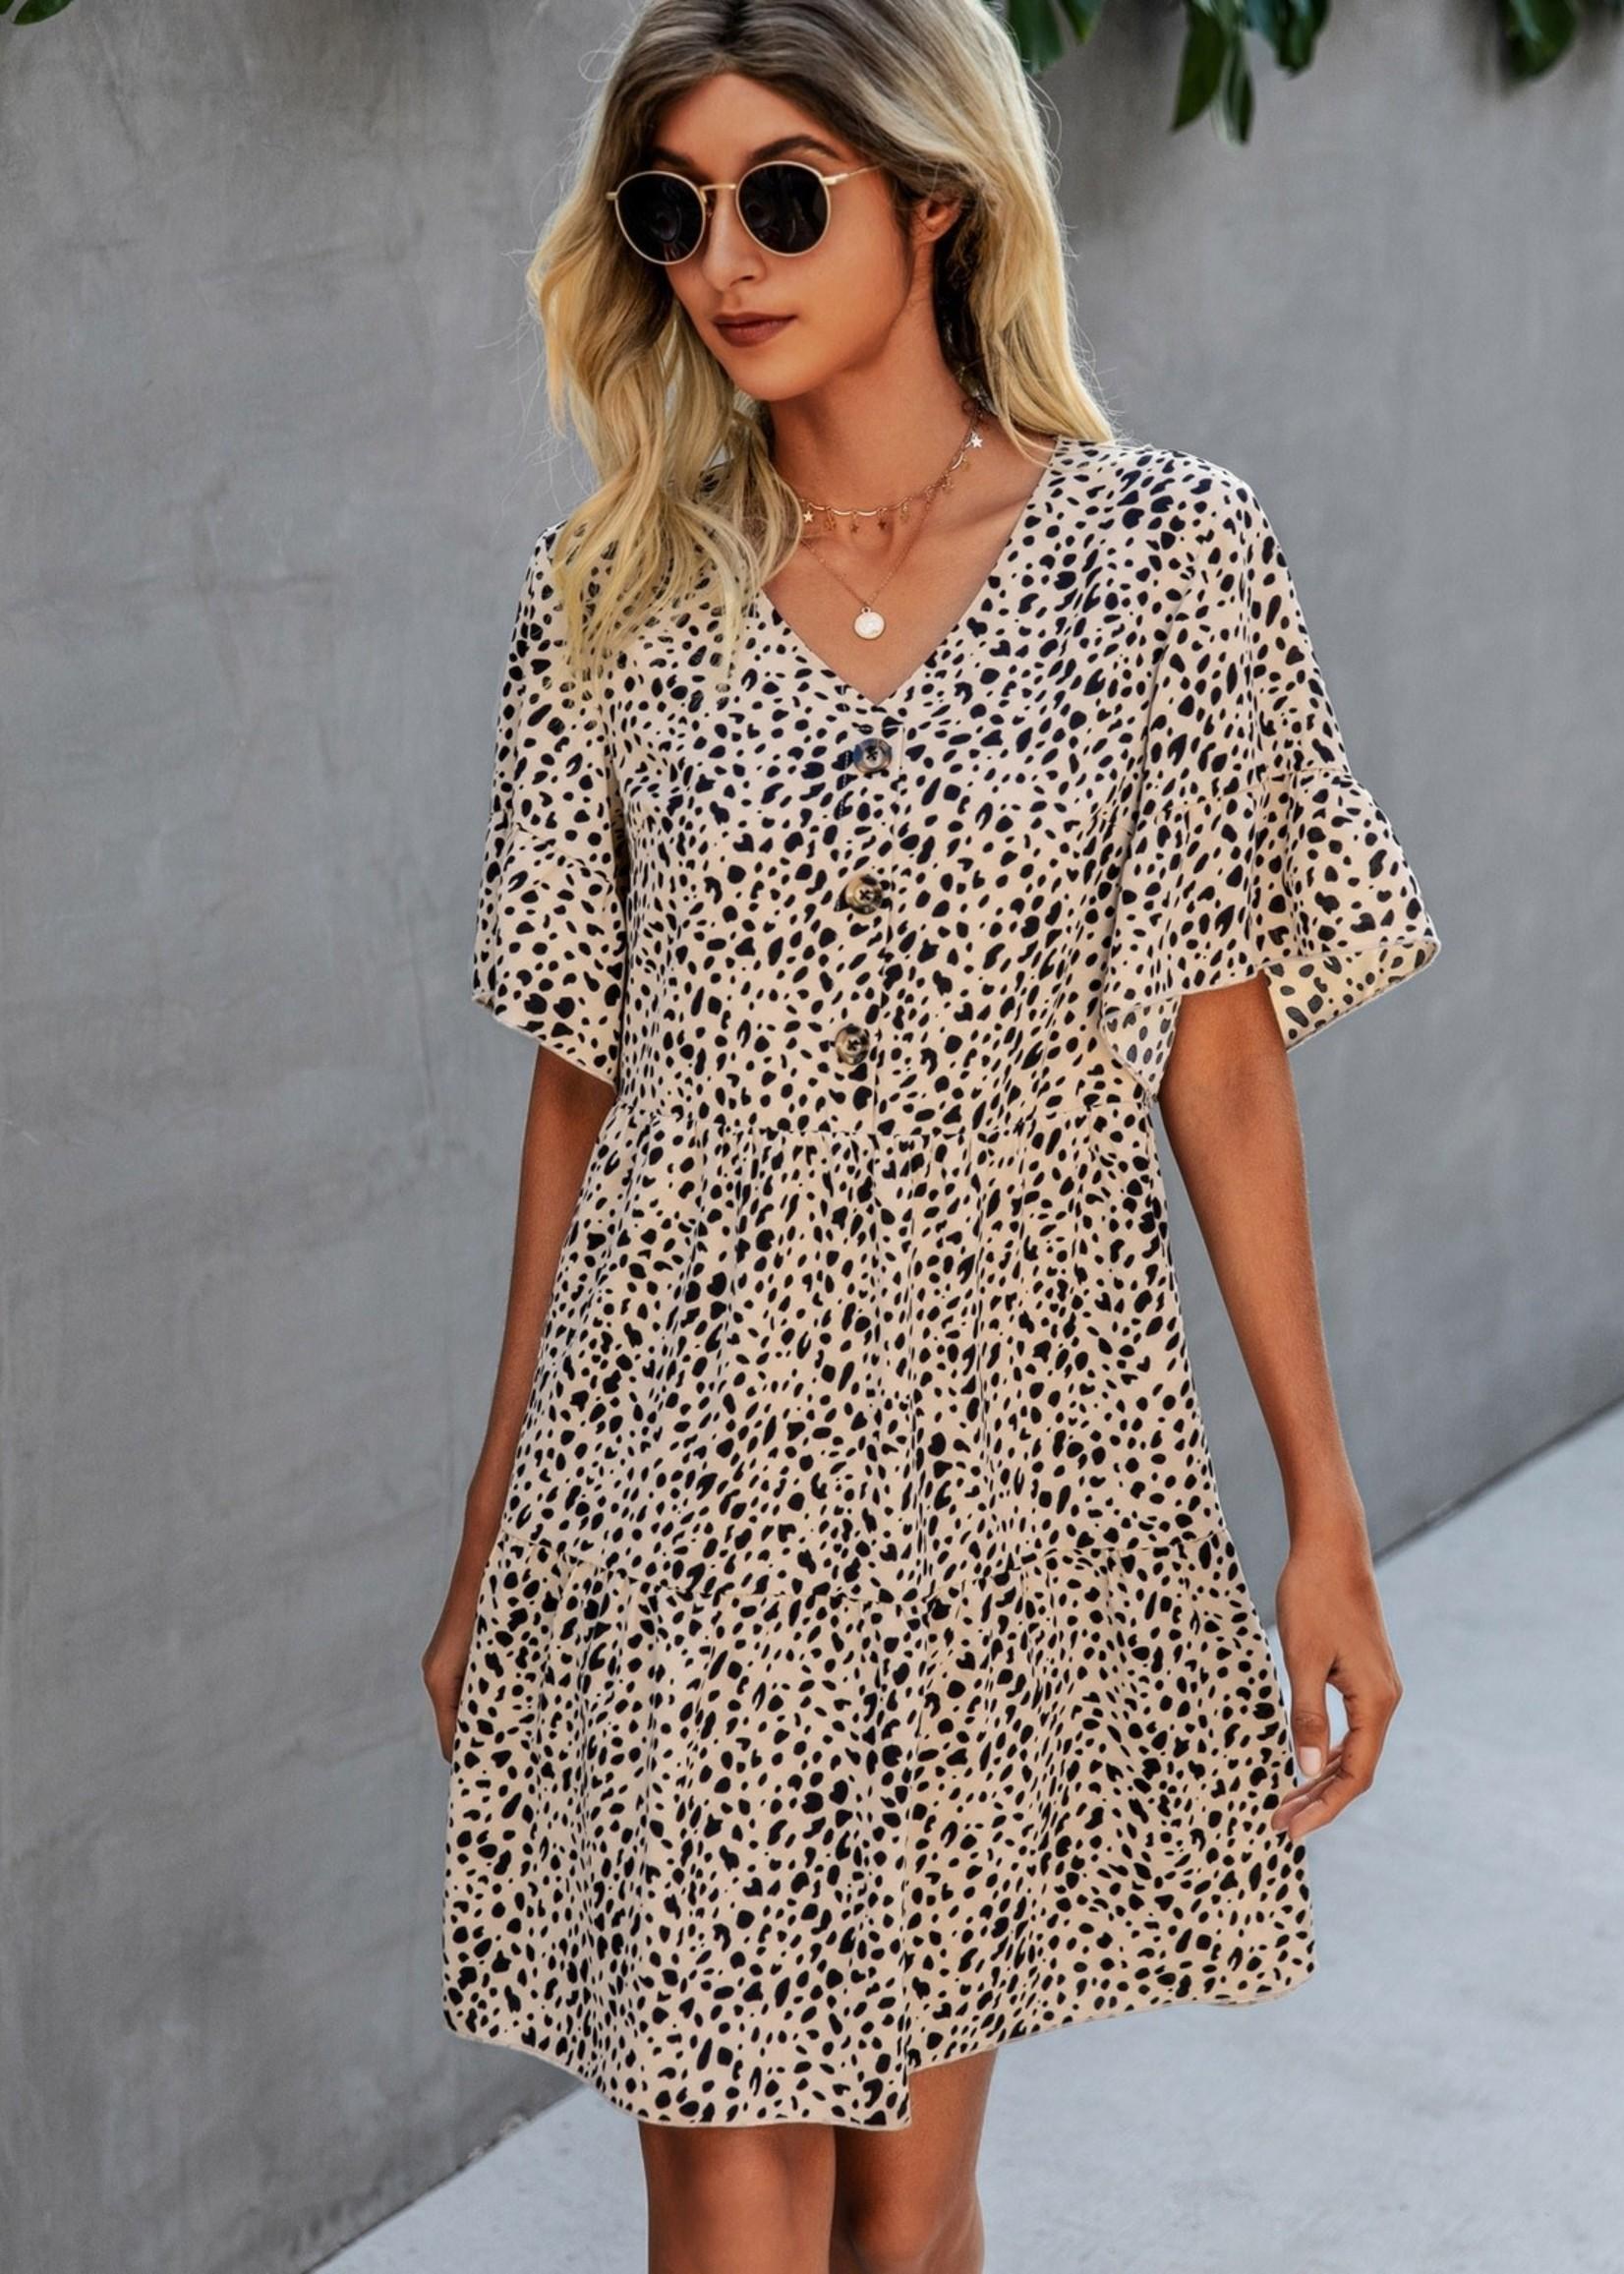 LeBLANC finds MAYA animal print dress